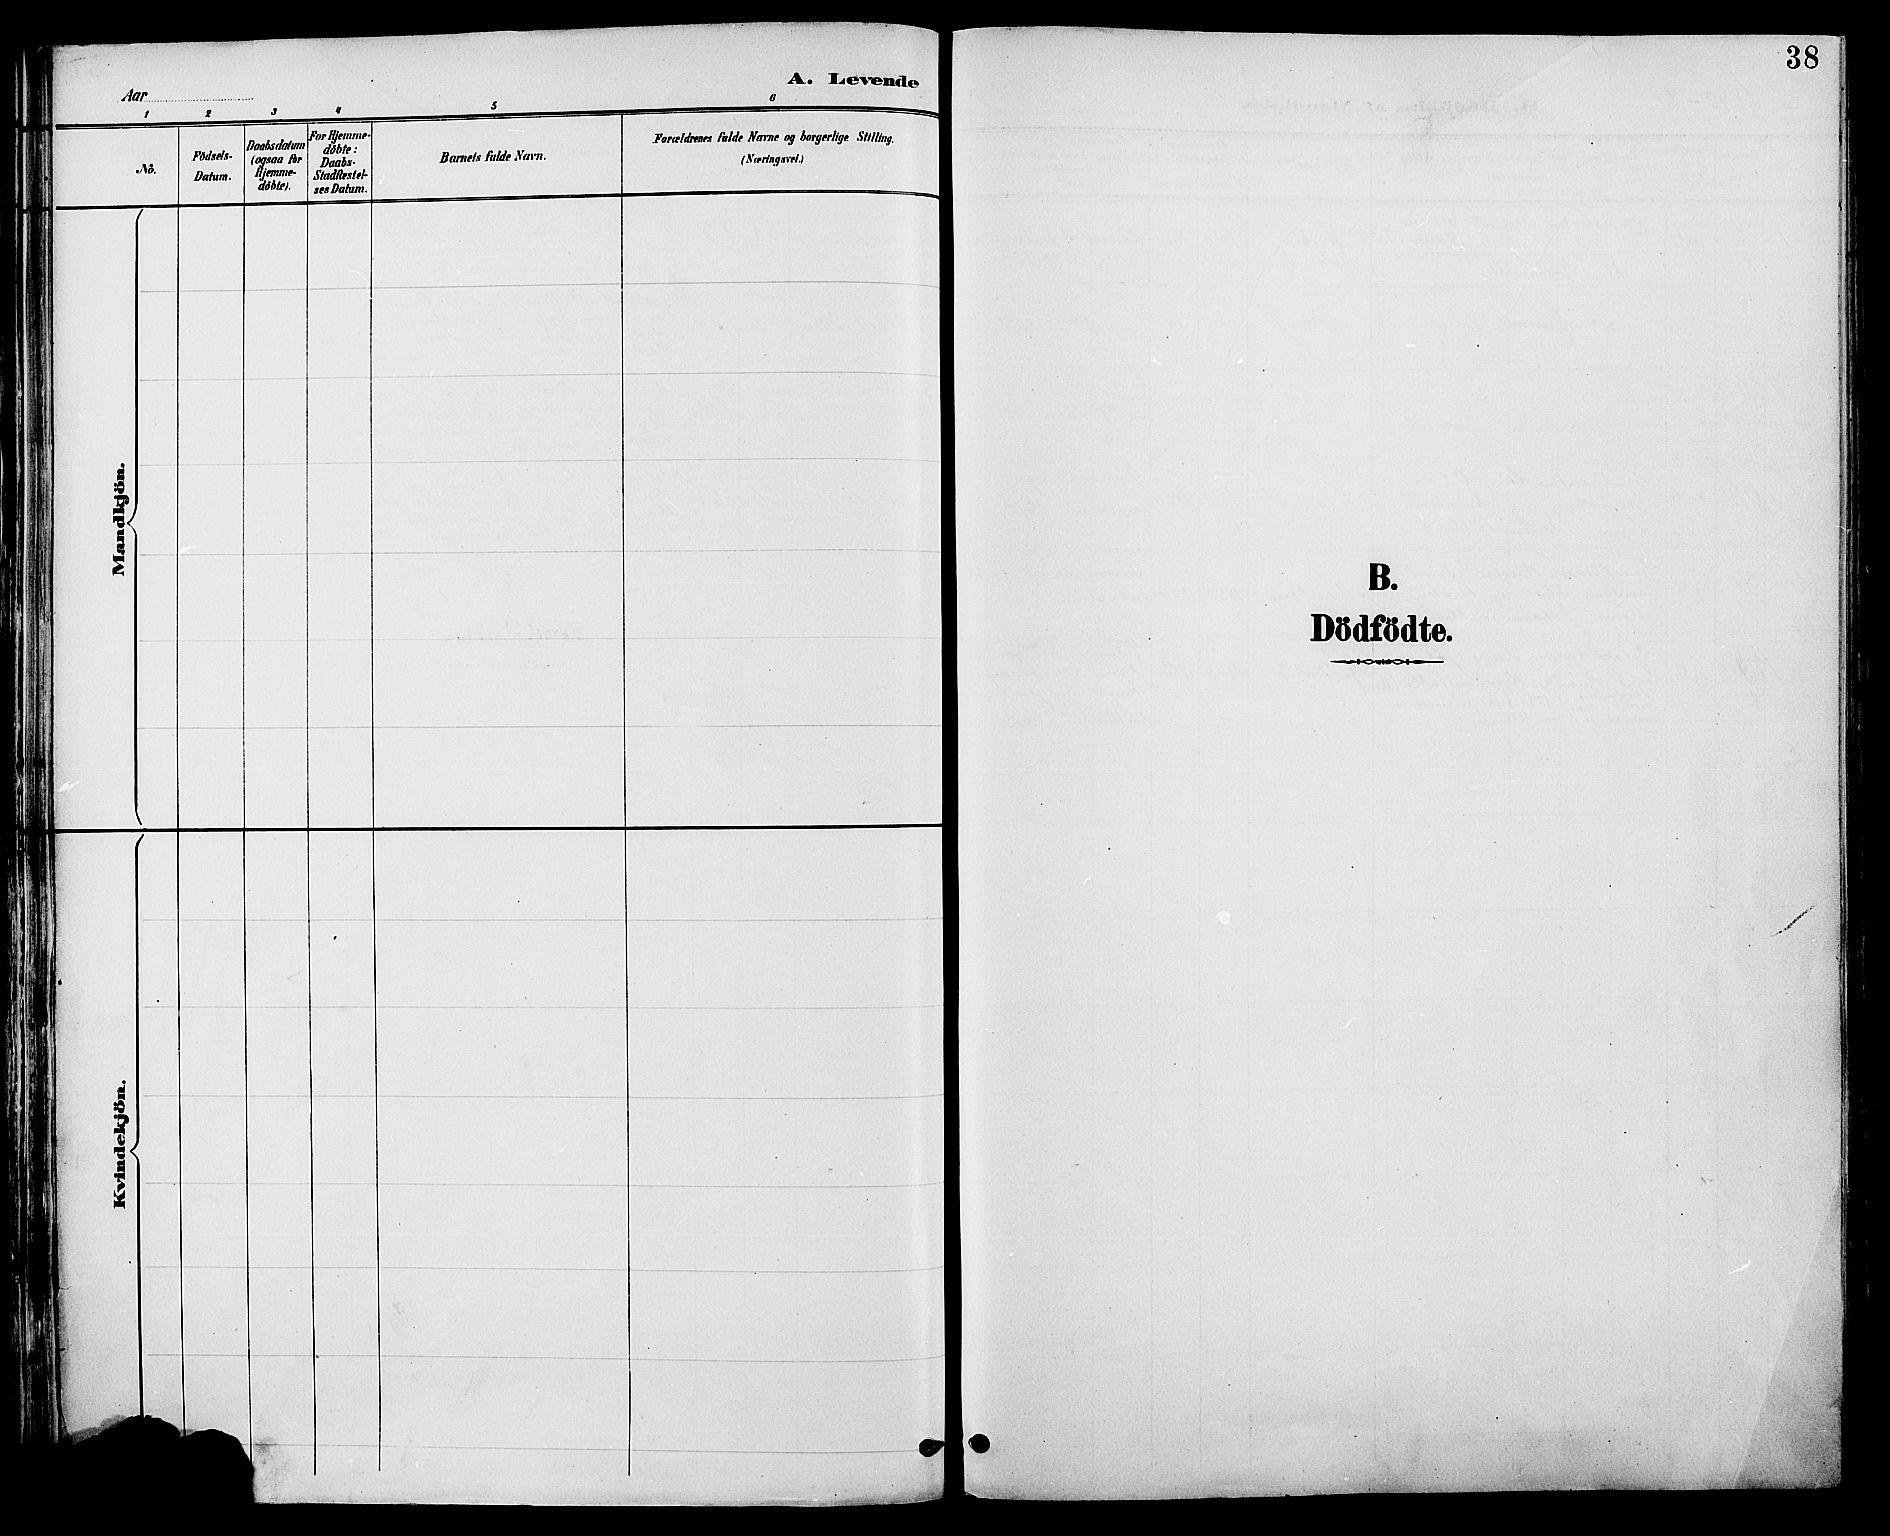 SAH, Biri prestekontor, Ministerialbok nr. 7, 1887-1893, s. 38